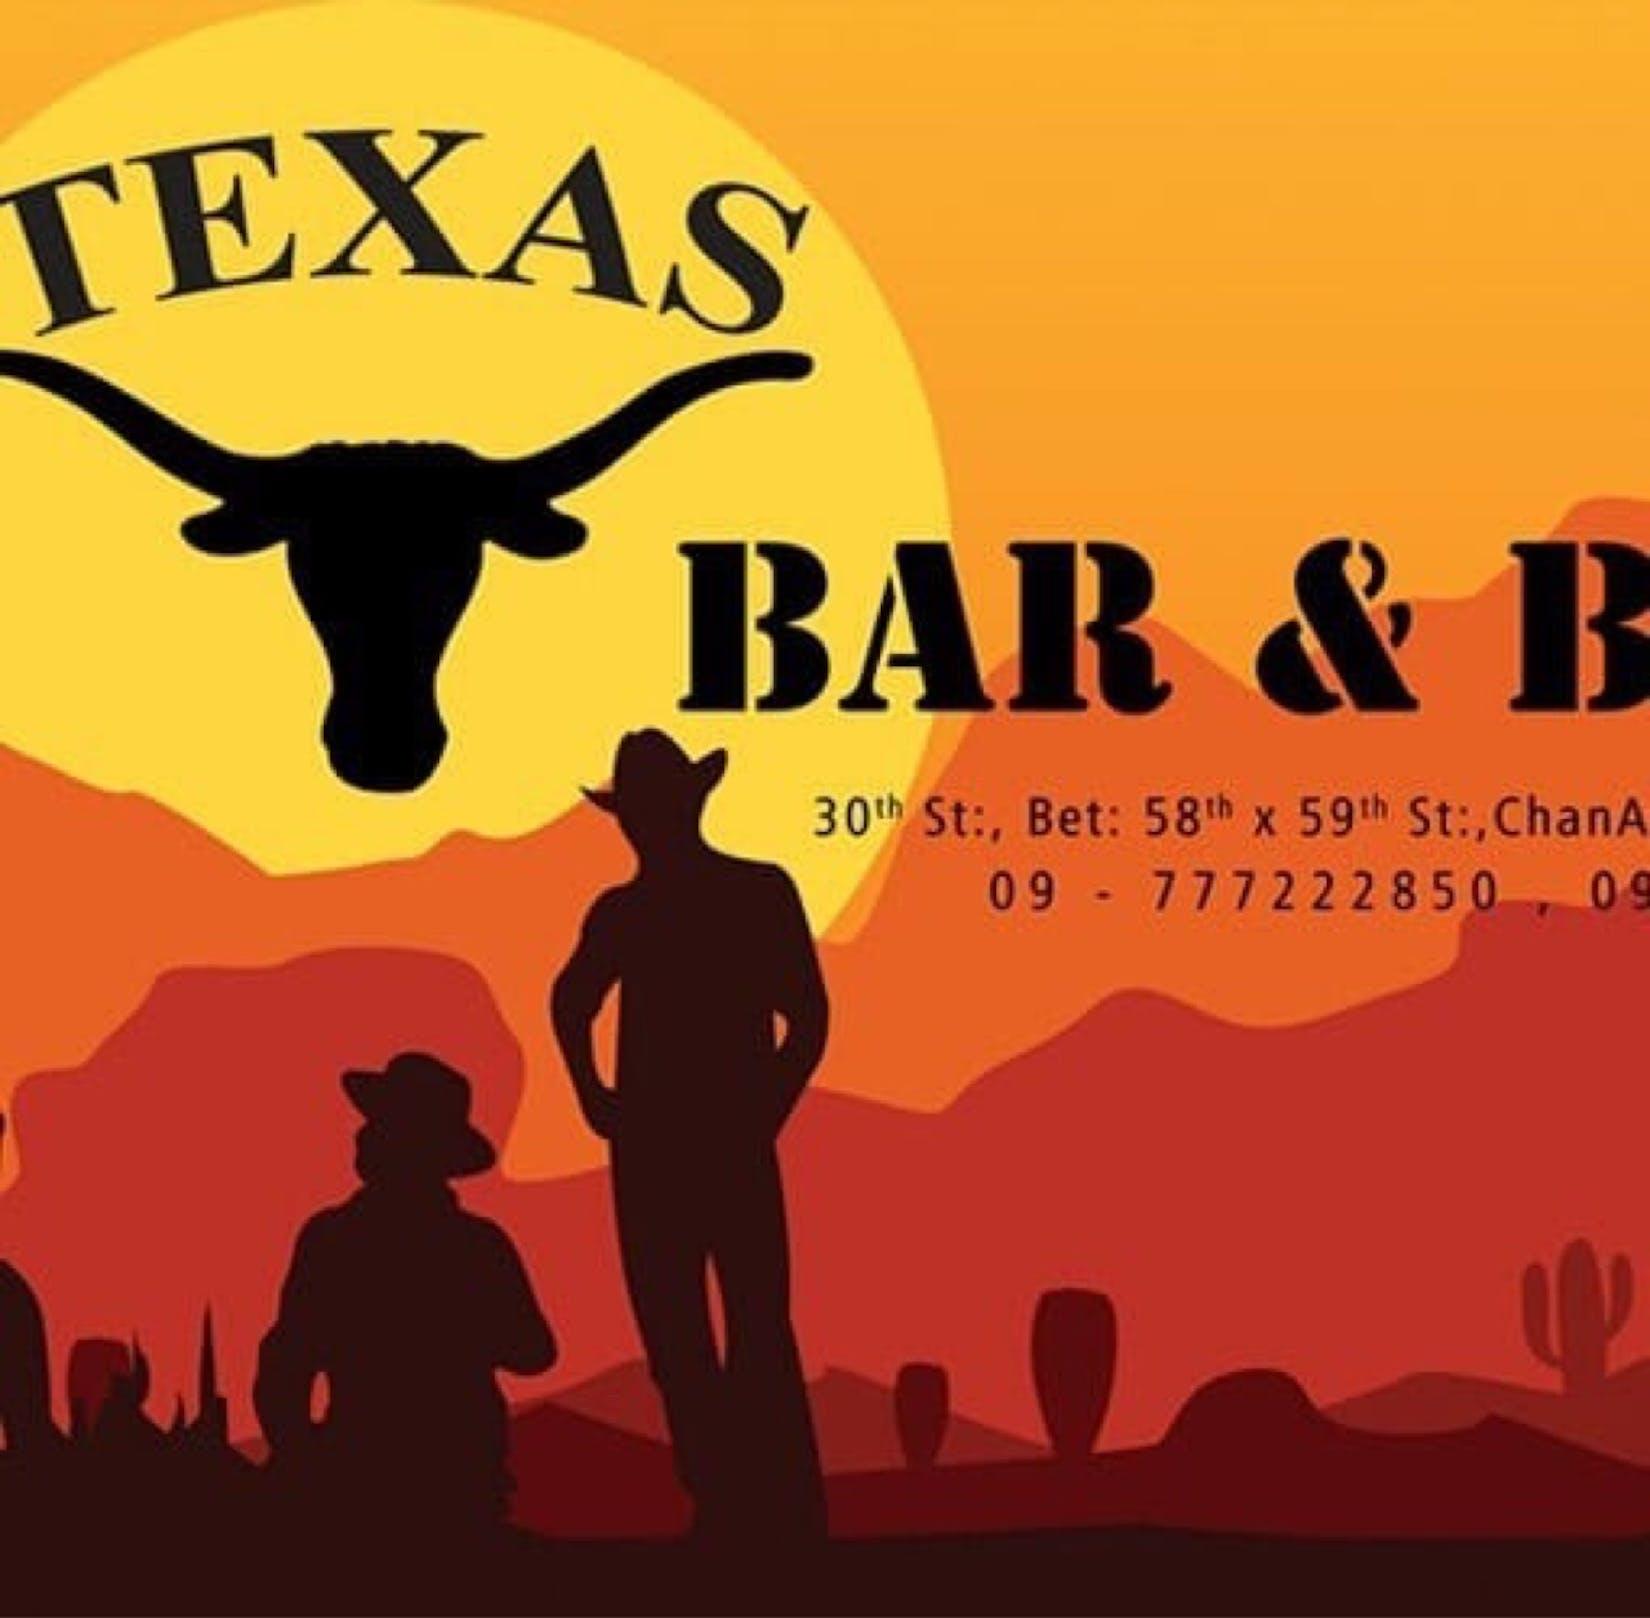 Texas Bar and BBQ | yathar